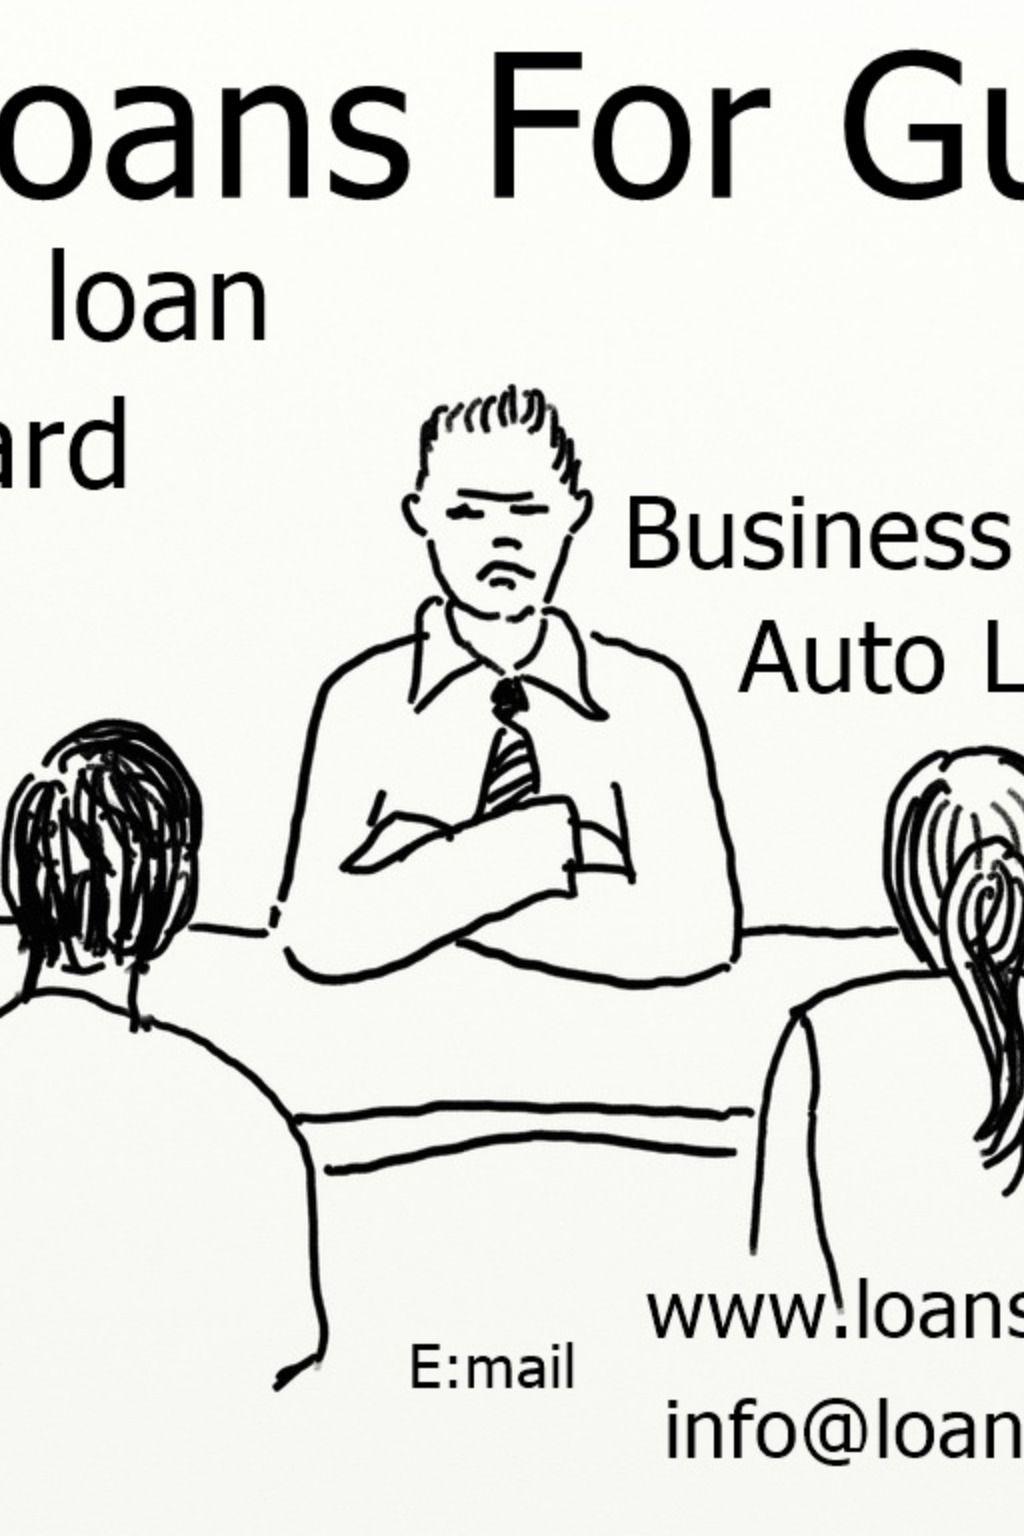 Loans For Gulf Loan Personal Finance Dubai